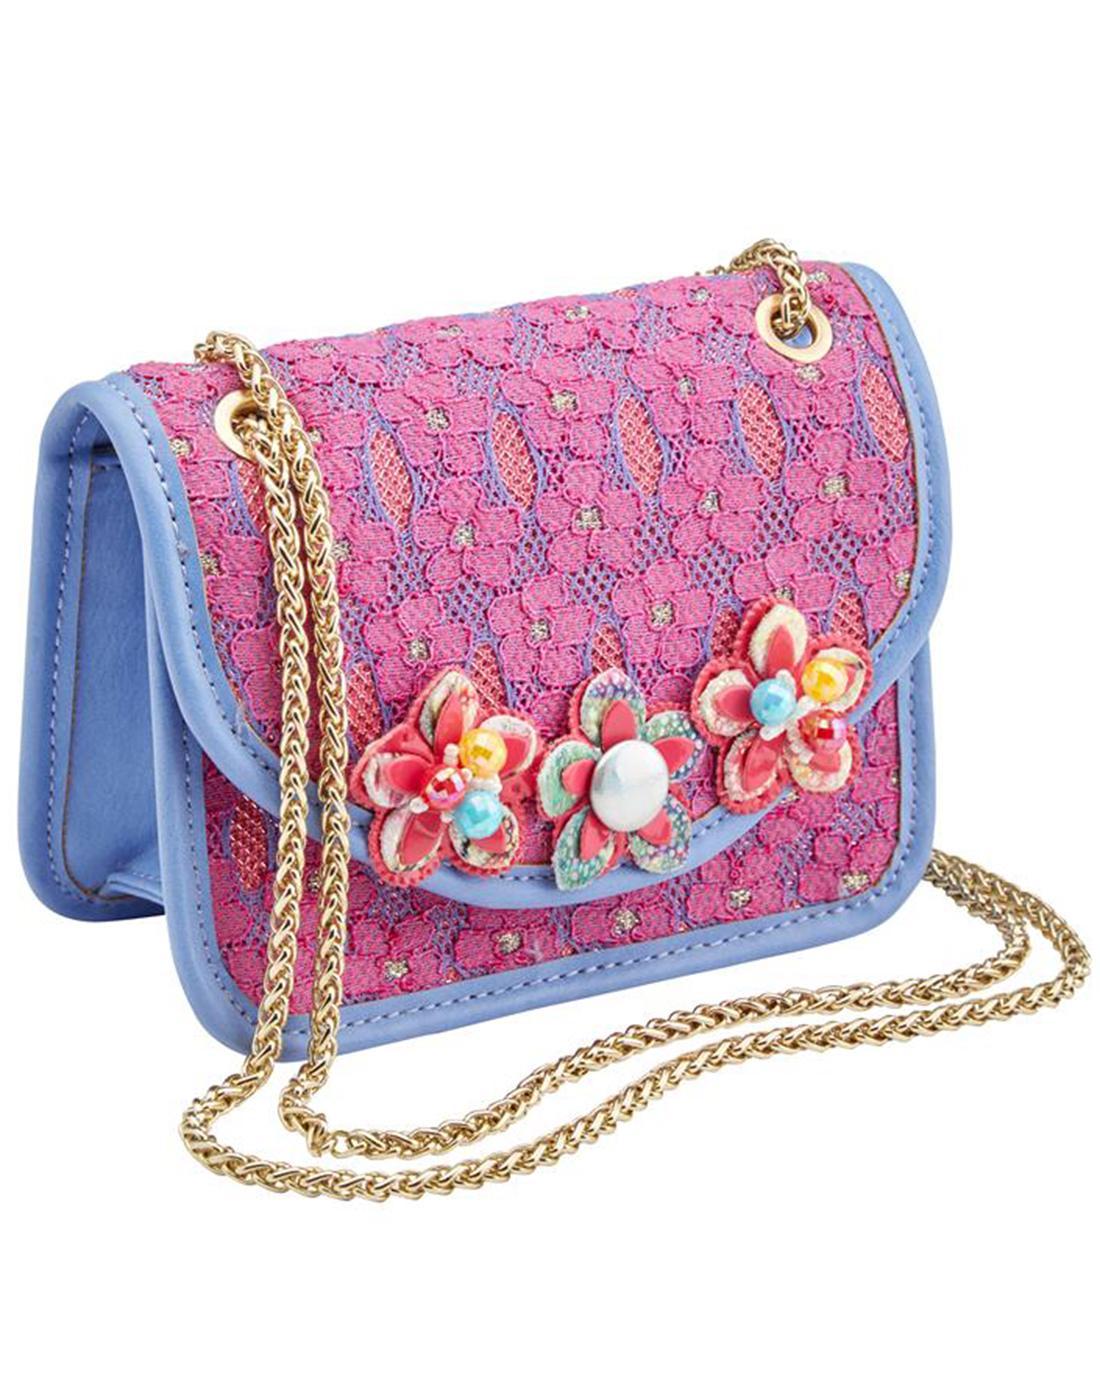 Malia JOE BROWNS Vintage Retro Pink Lace Handbag